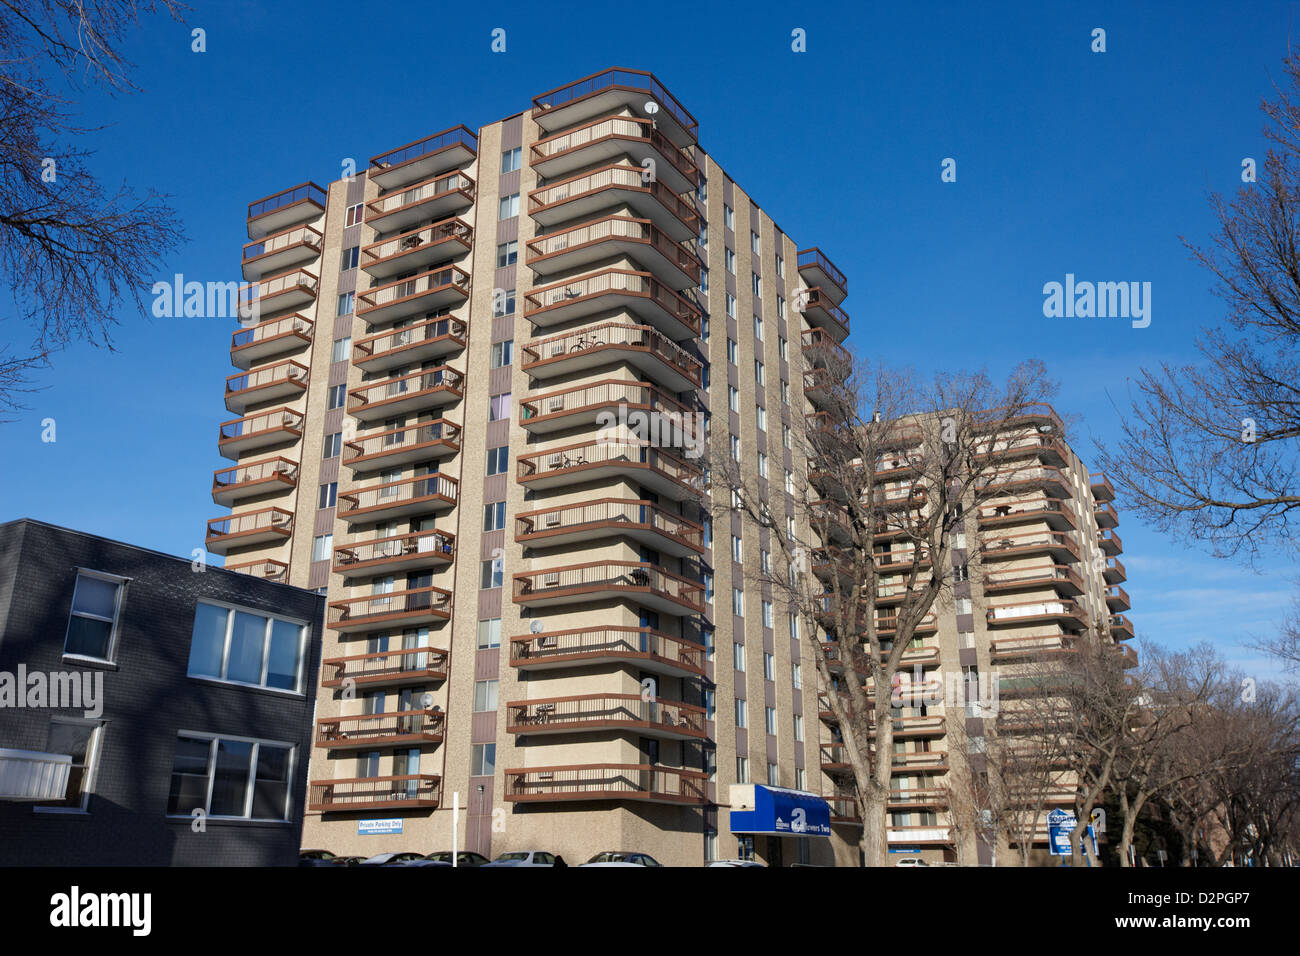 regal towers high rise apartment blocks Saskatoon Saskatchewan Canada - Stock Image